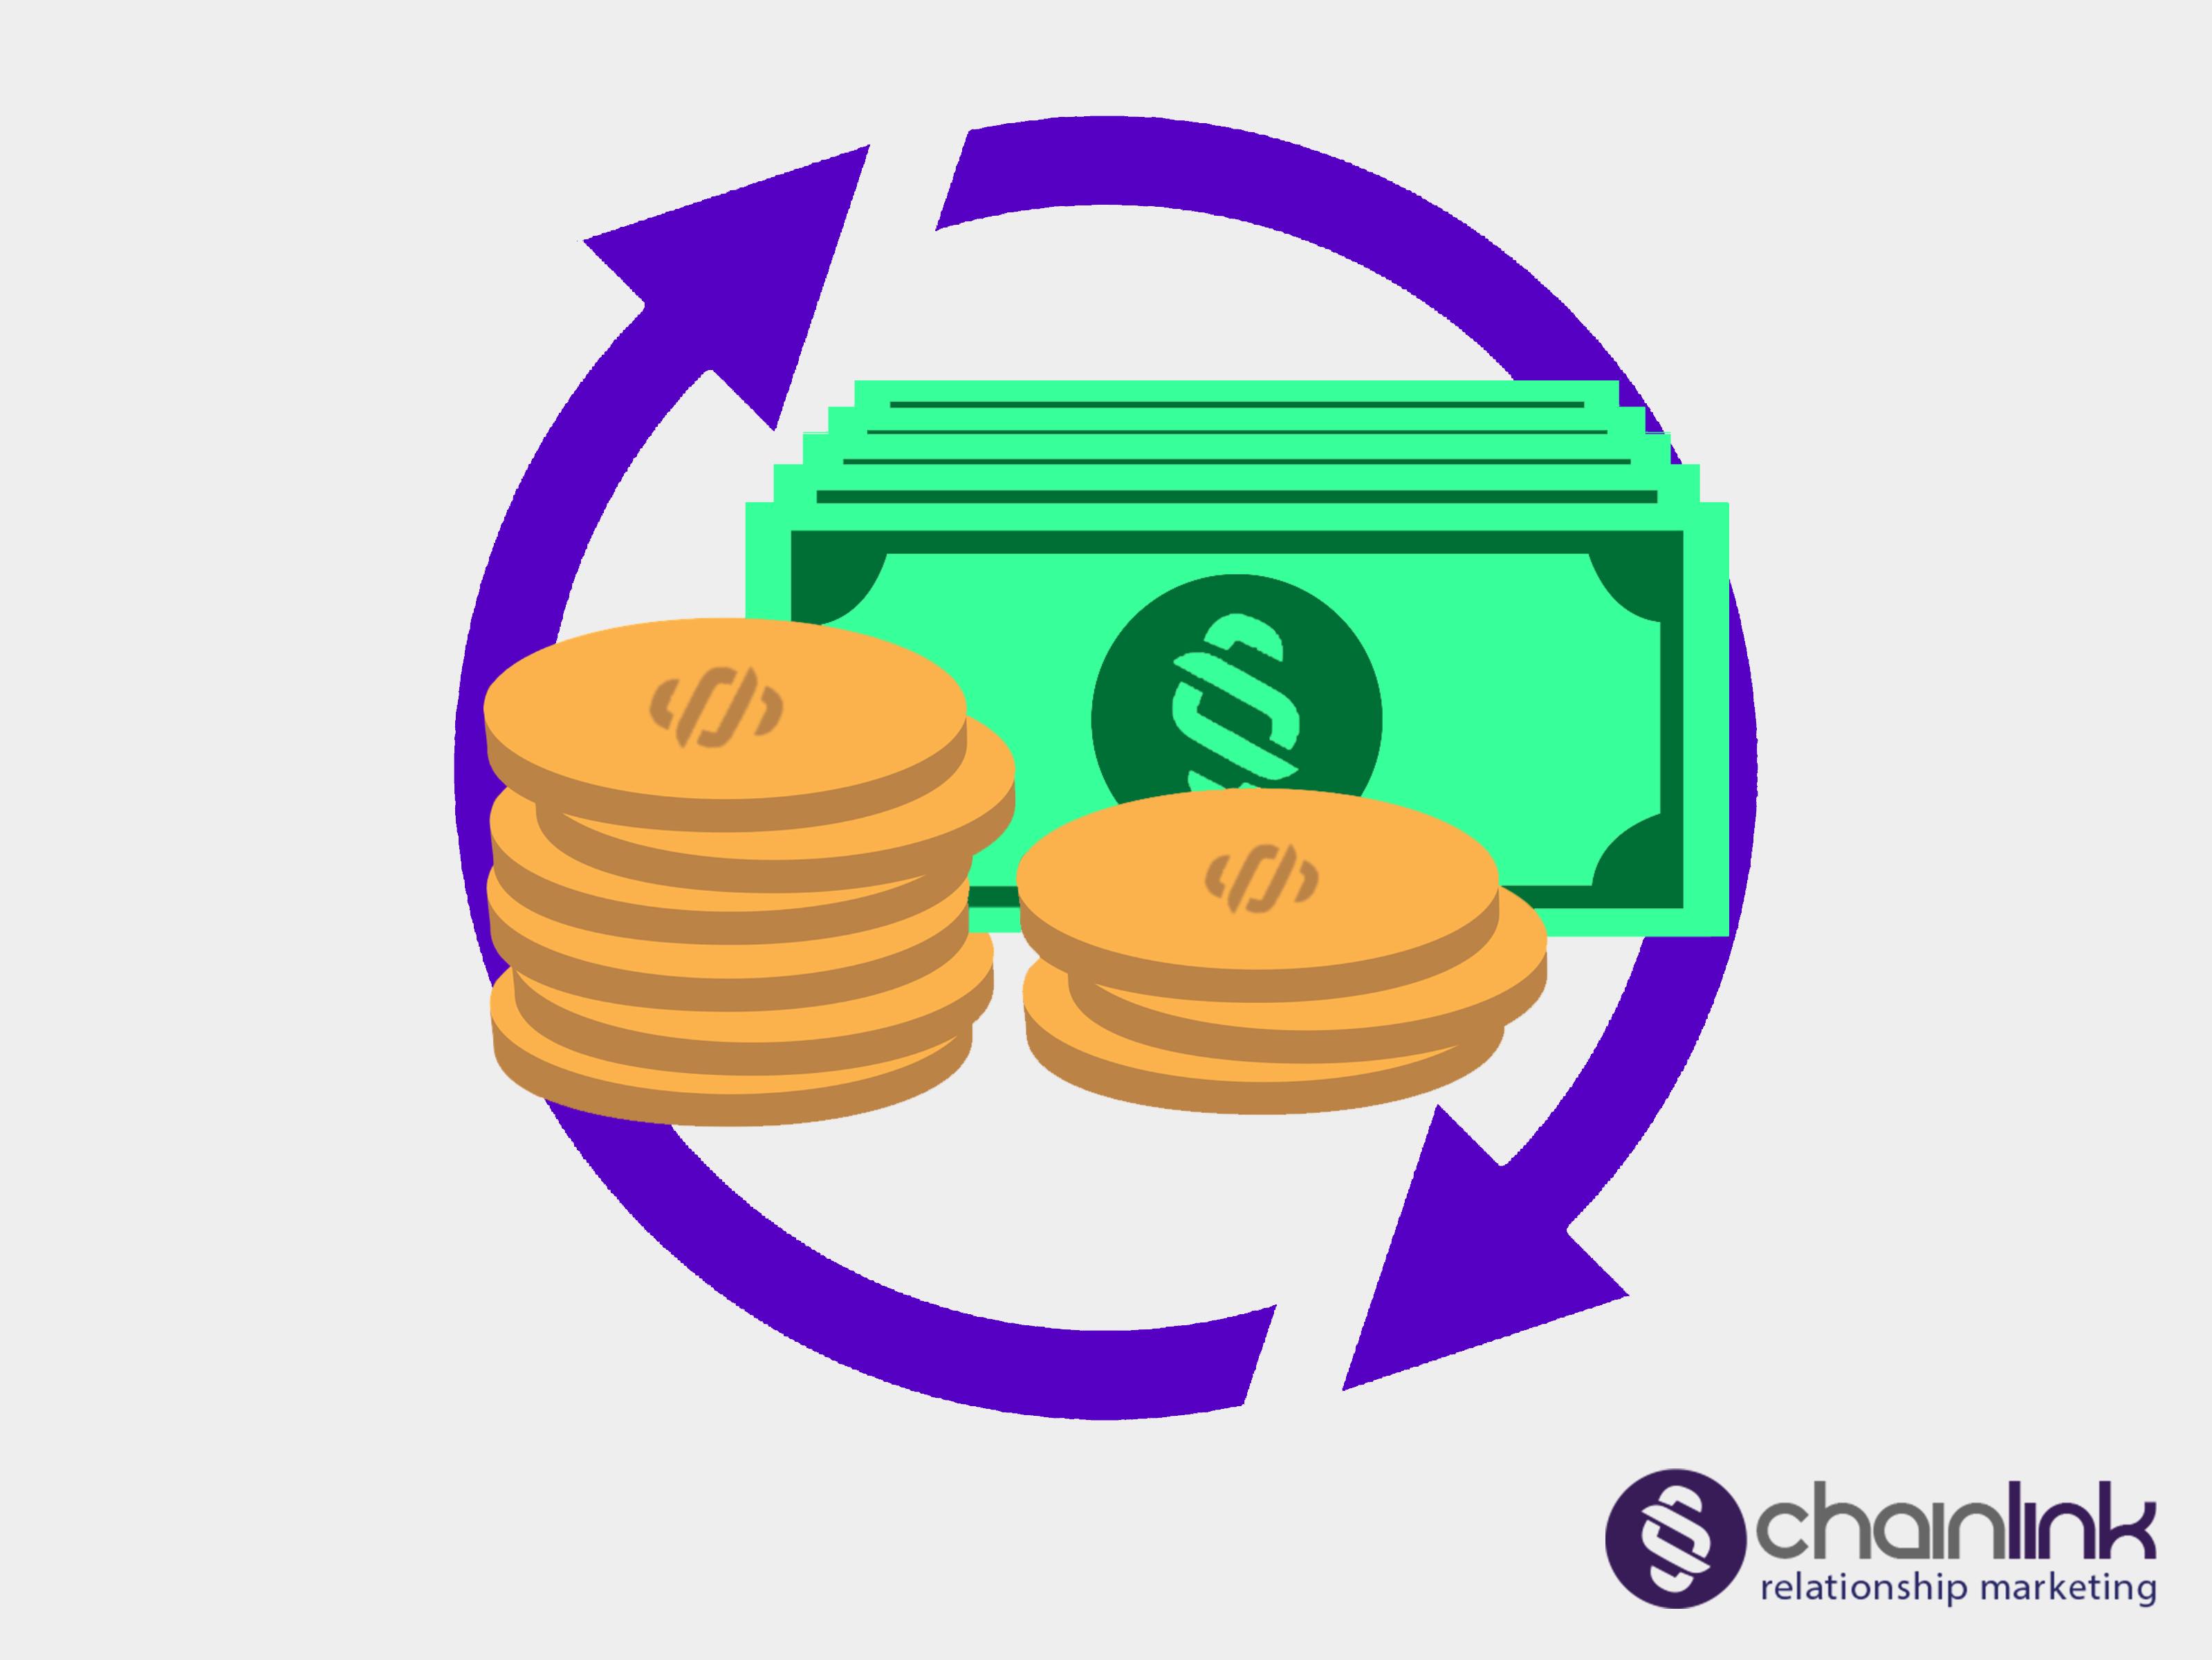 Chainlink Relationship Marketing- marketing ROI